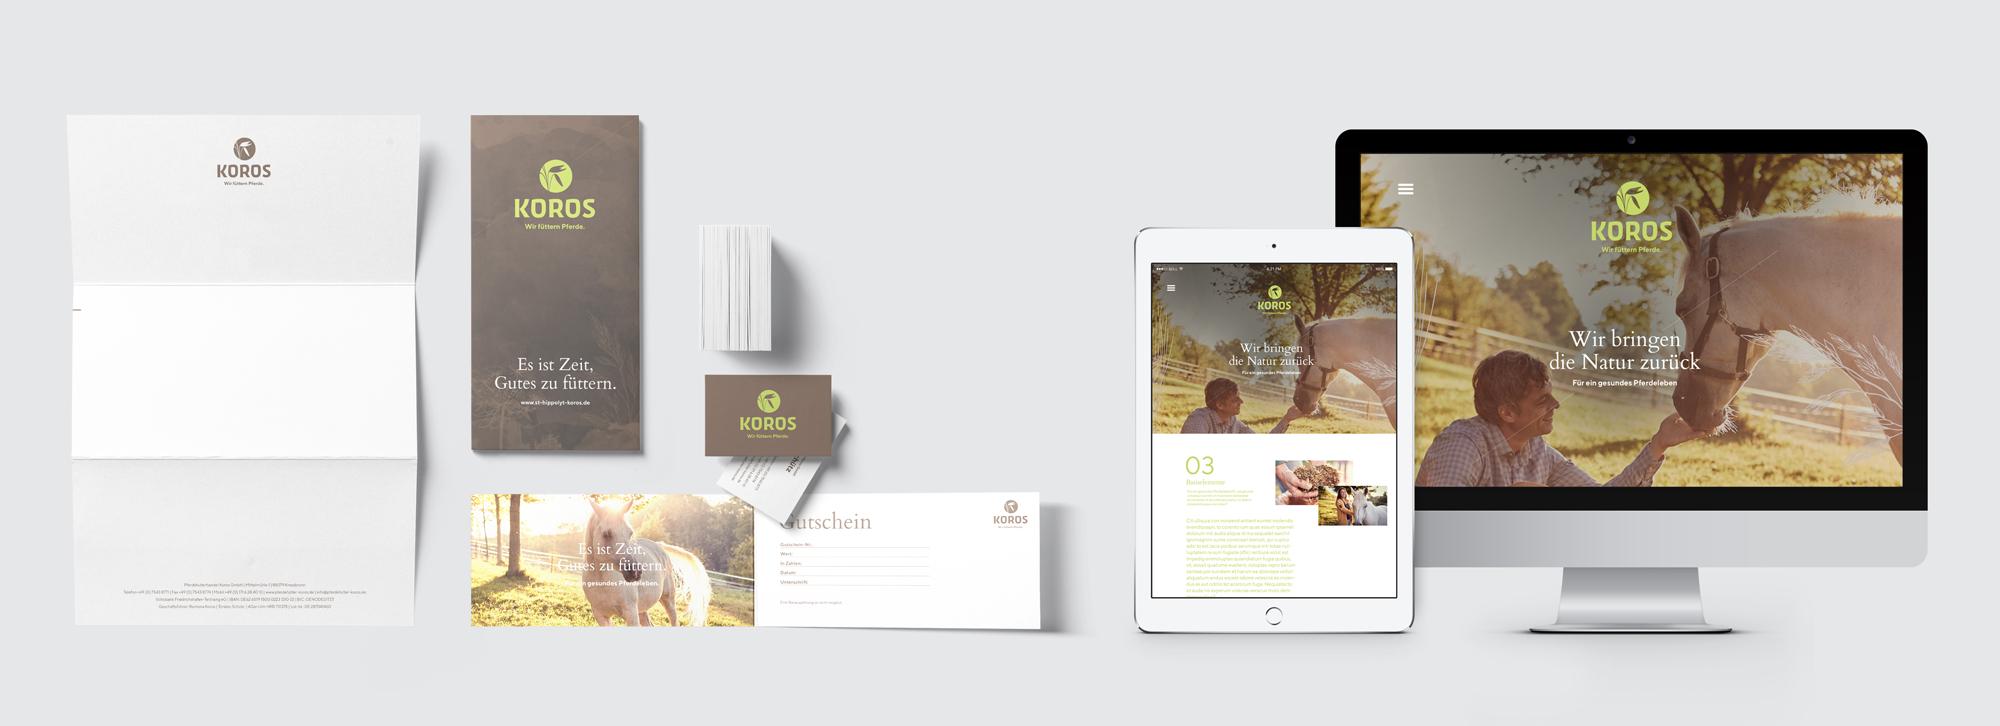 KOROS Corporate Design